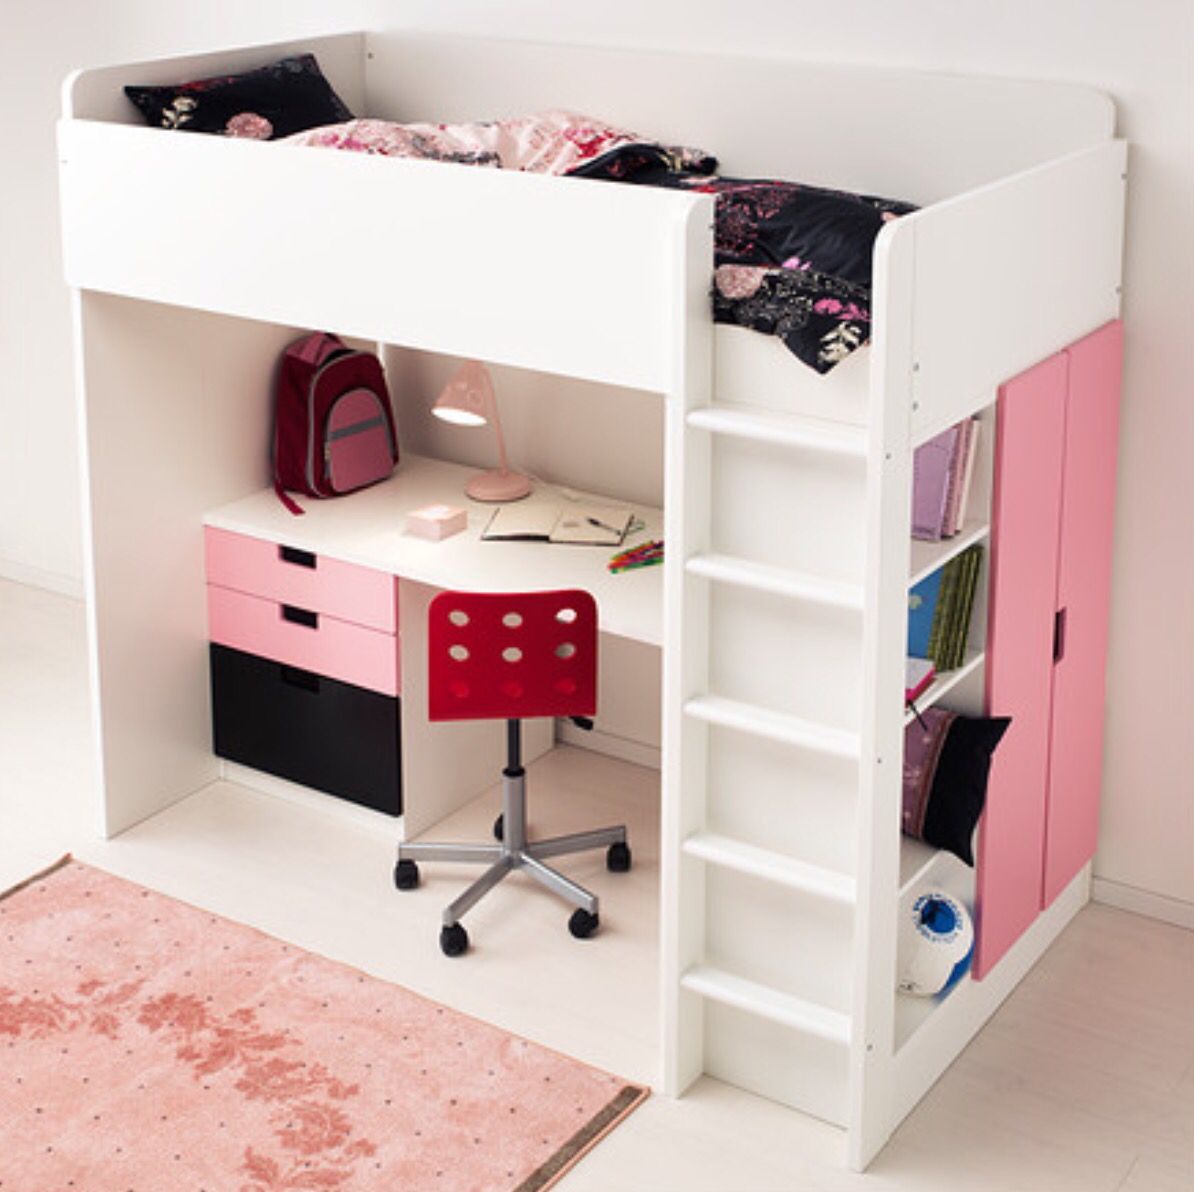 Under loft bed decorating ideas  Stuva hoogslaper  mooie spullen  Pinterest  Lofts Drawers and Doors